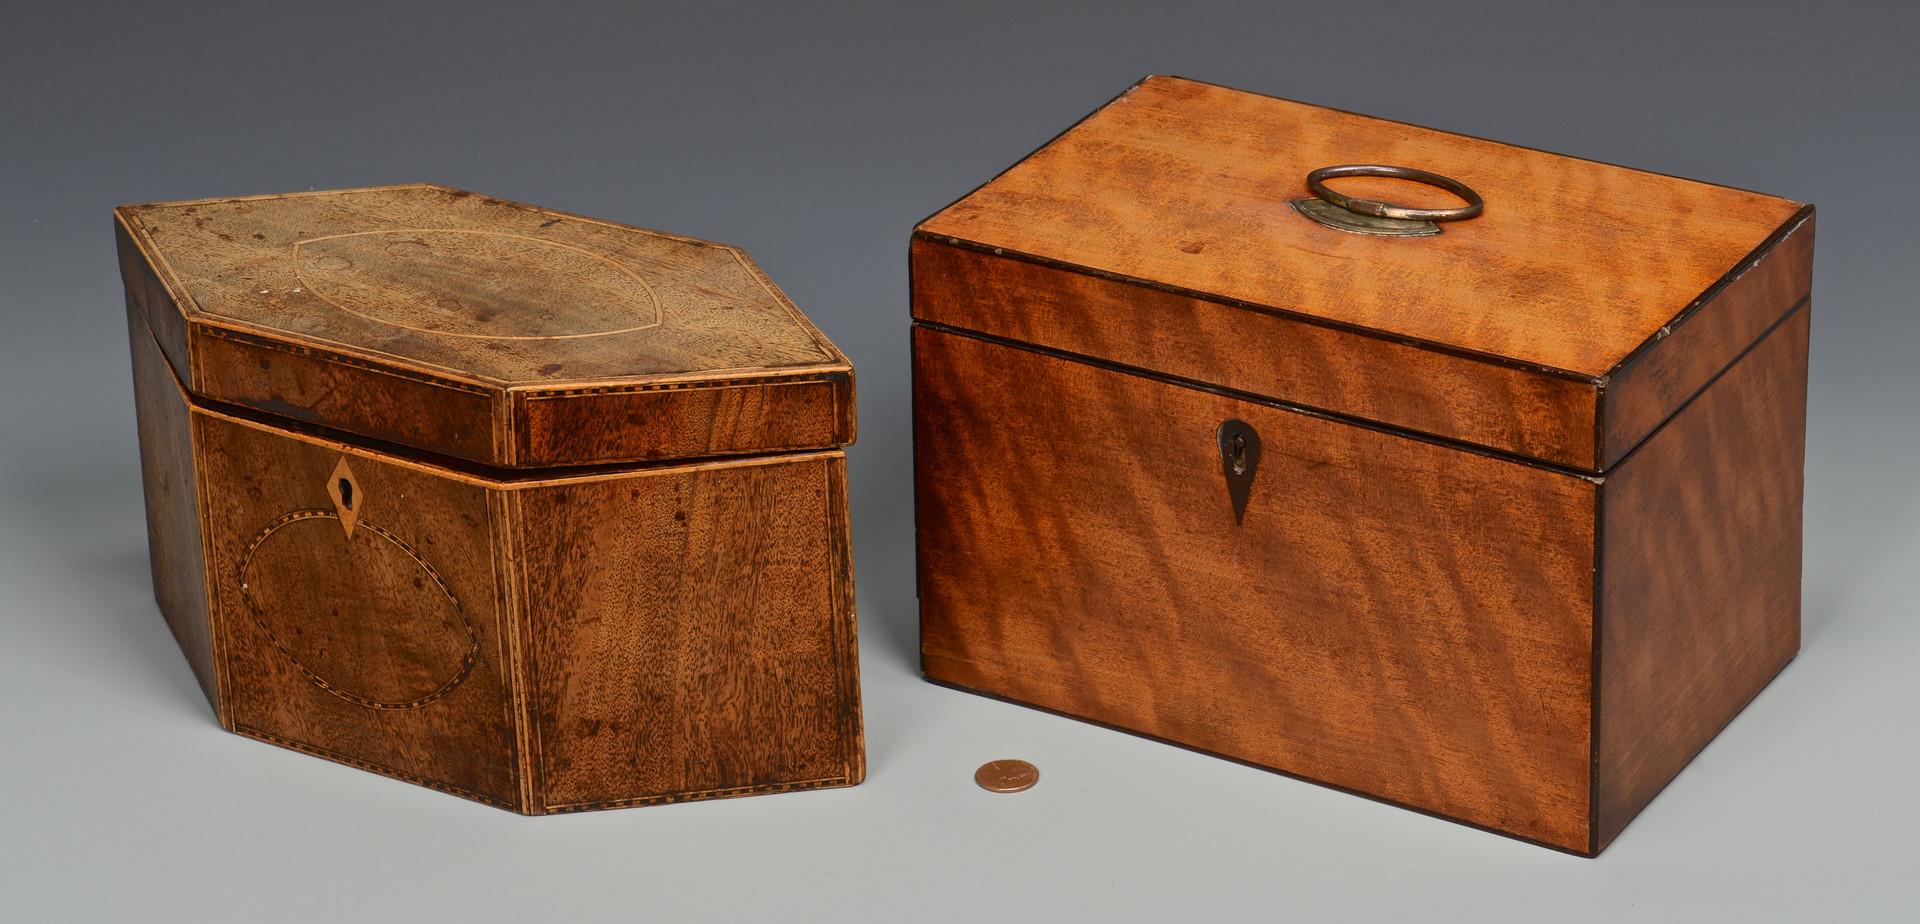 Lot 158: Two (2) English Tea Caddies, Mahogany